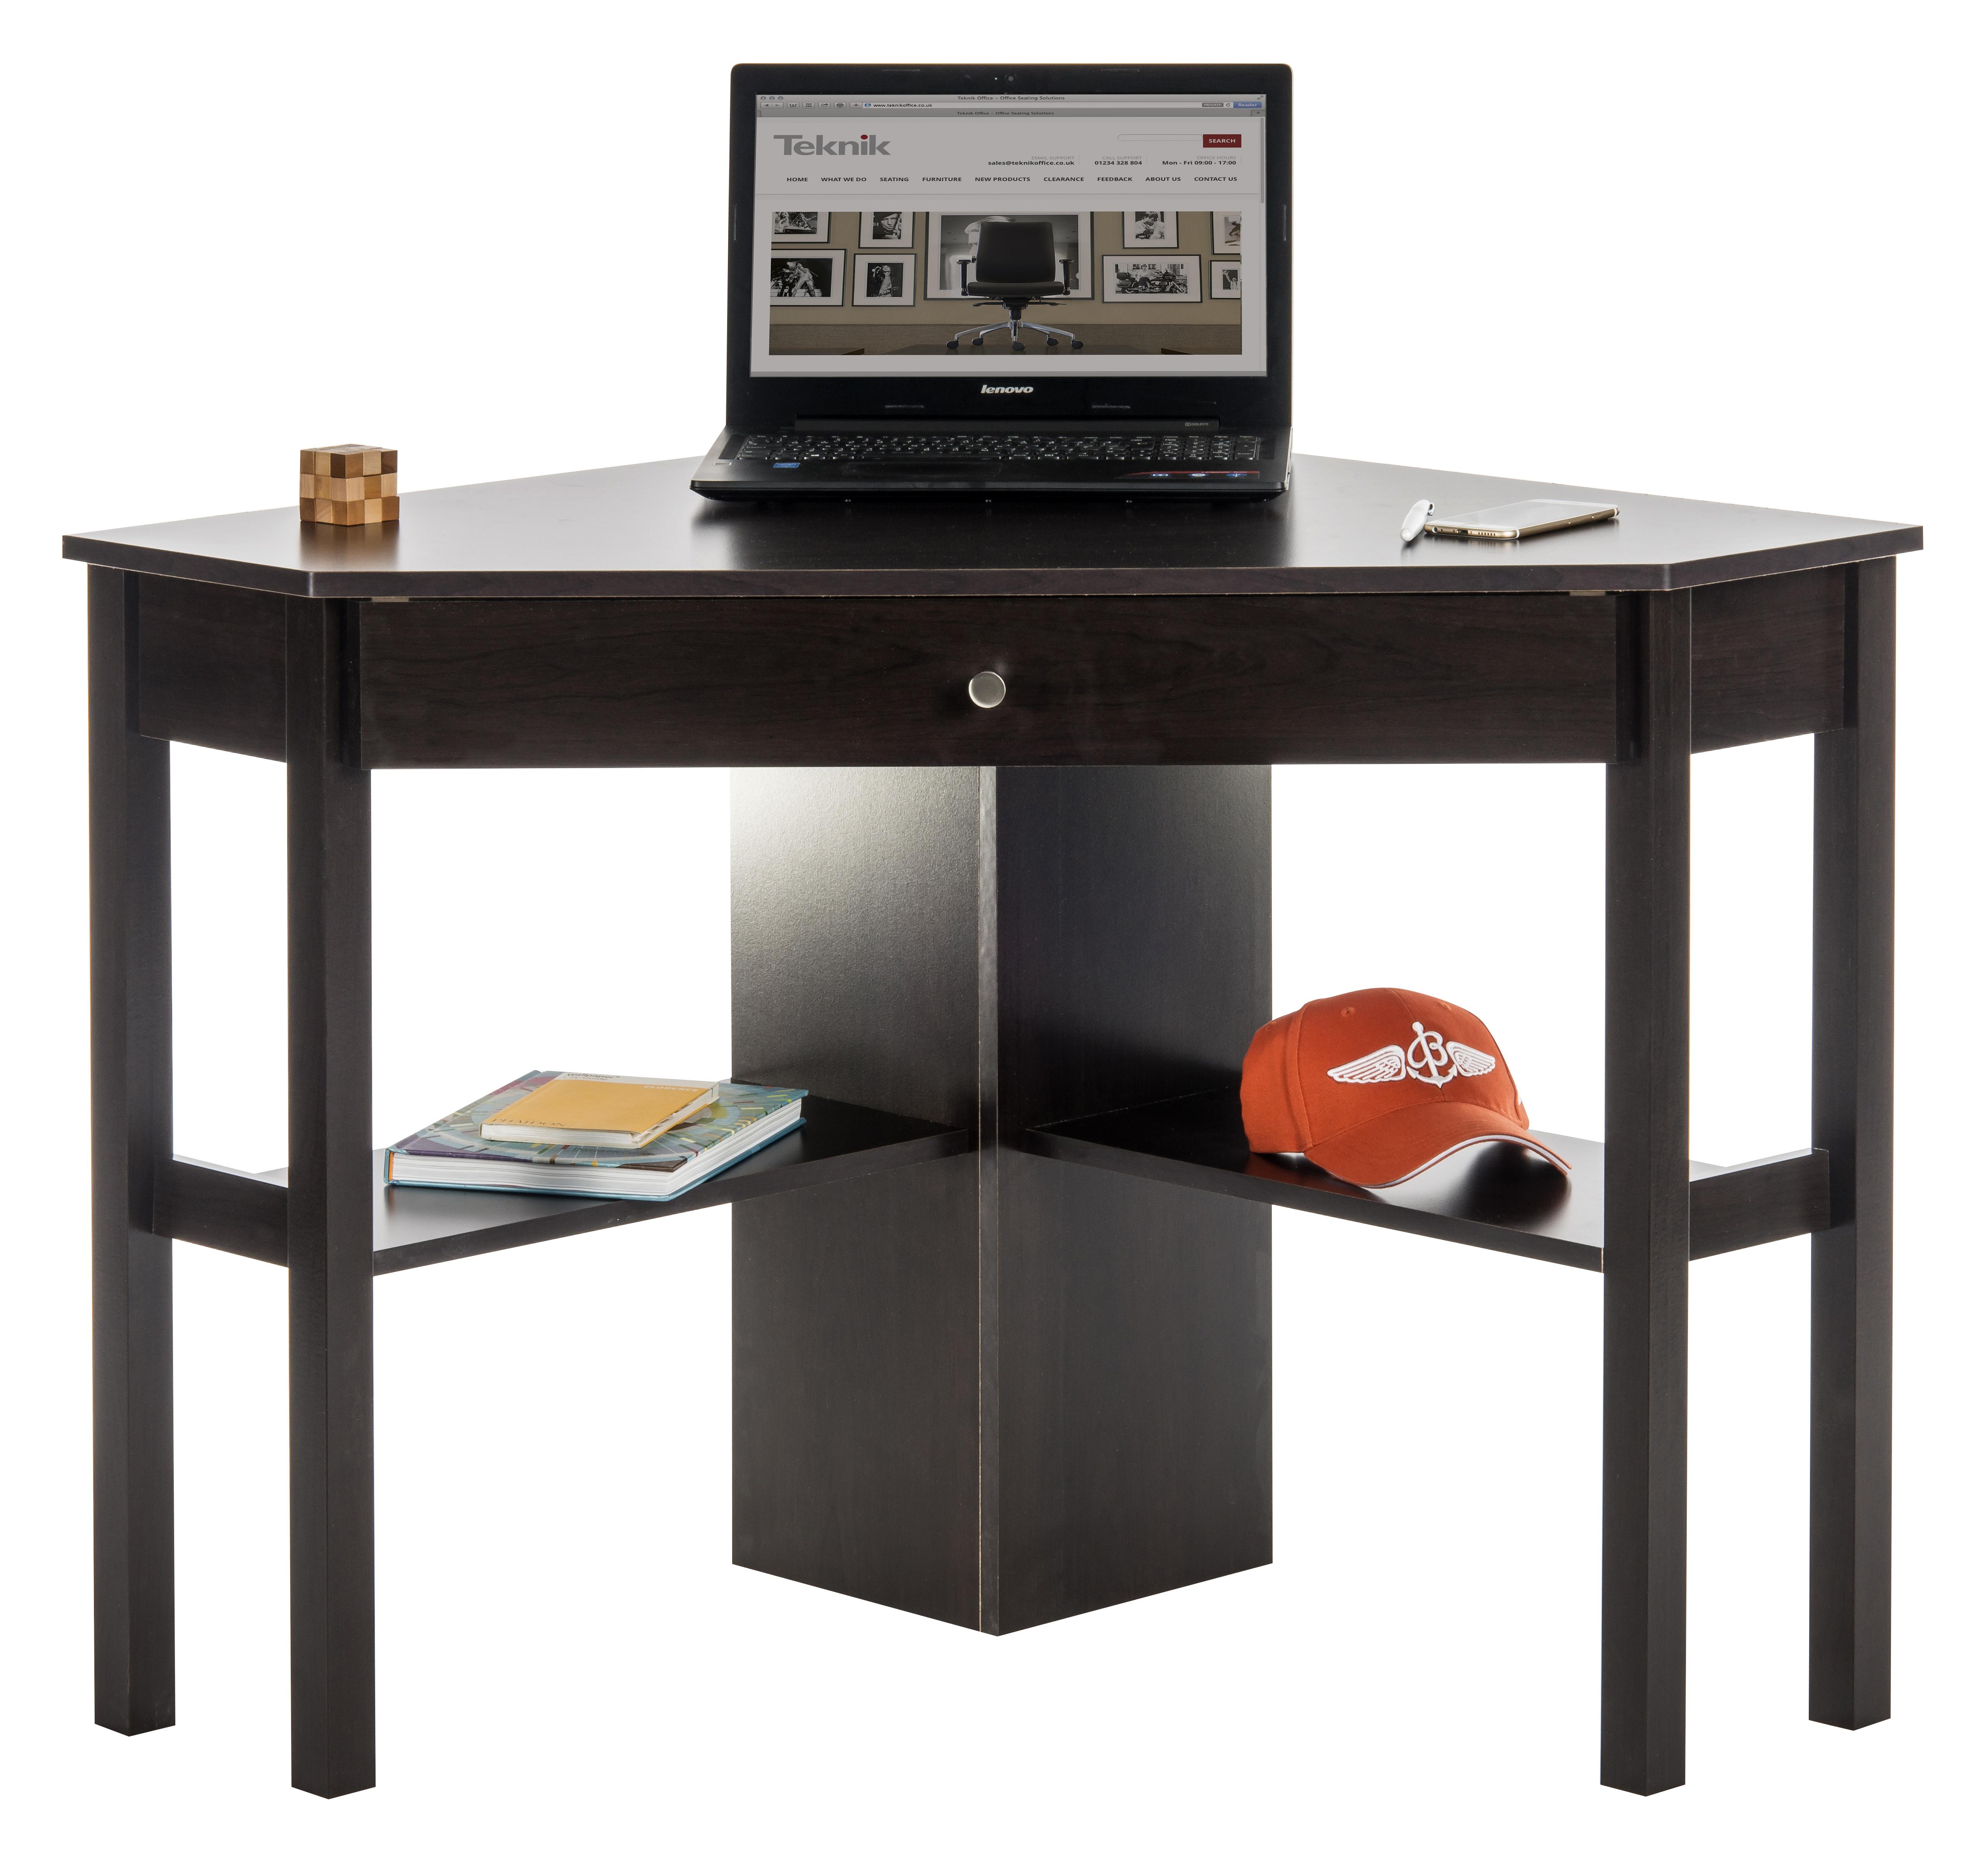 Teknik Office Cinnamon Cherry Effect Home Office Corner Desk With Keyboard Drawer